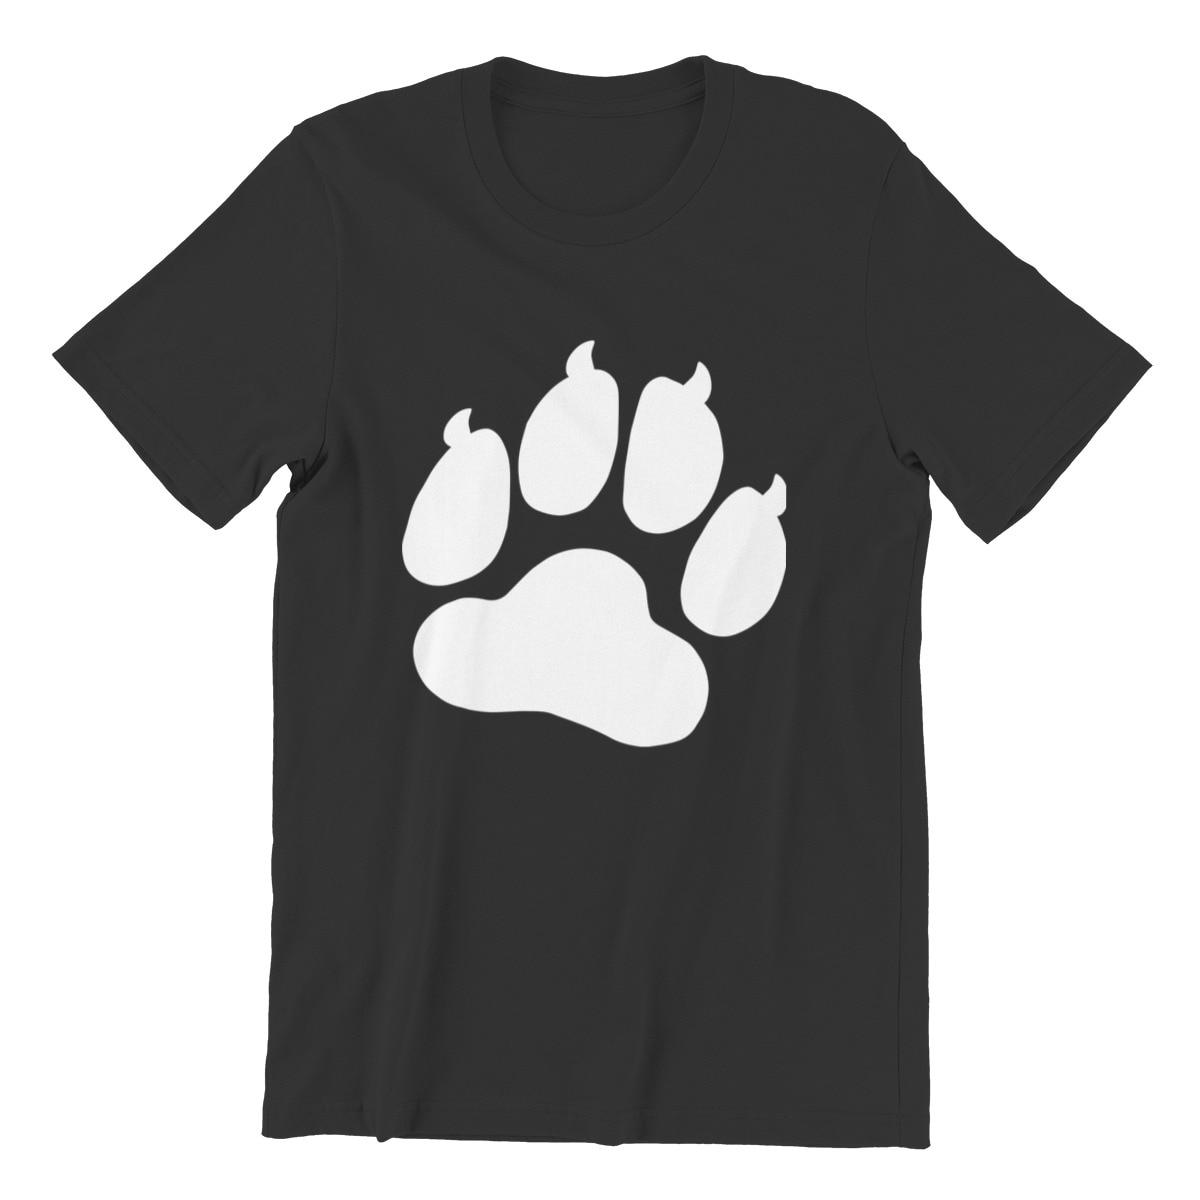 Camiseta masculina gigante gato pata amor retro gola redonda hip-hop roupas masculinas 60089